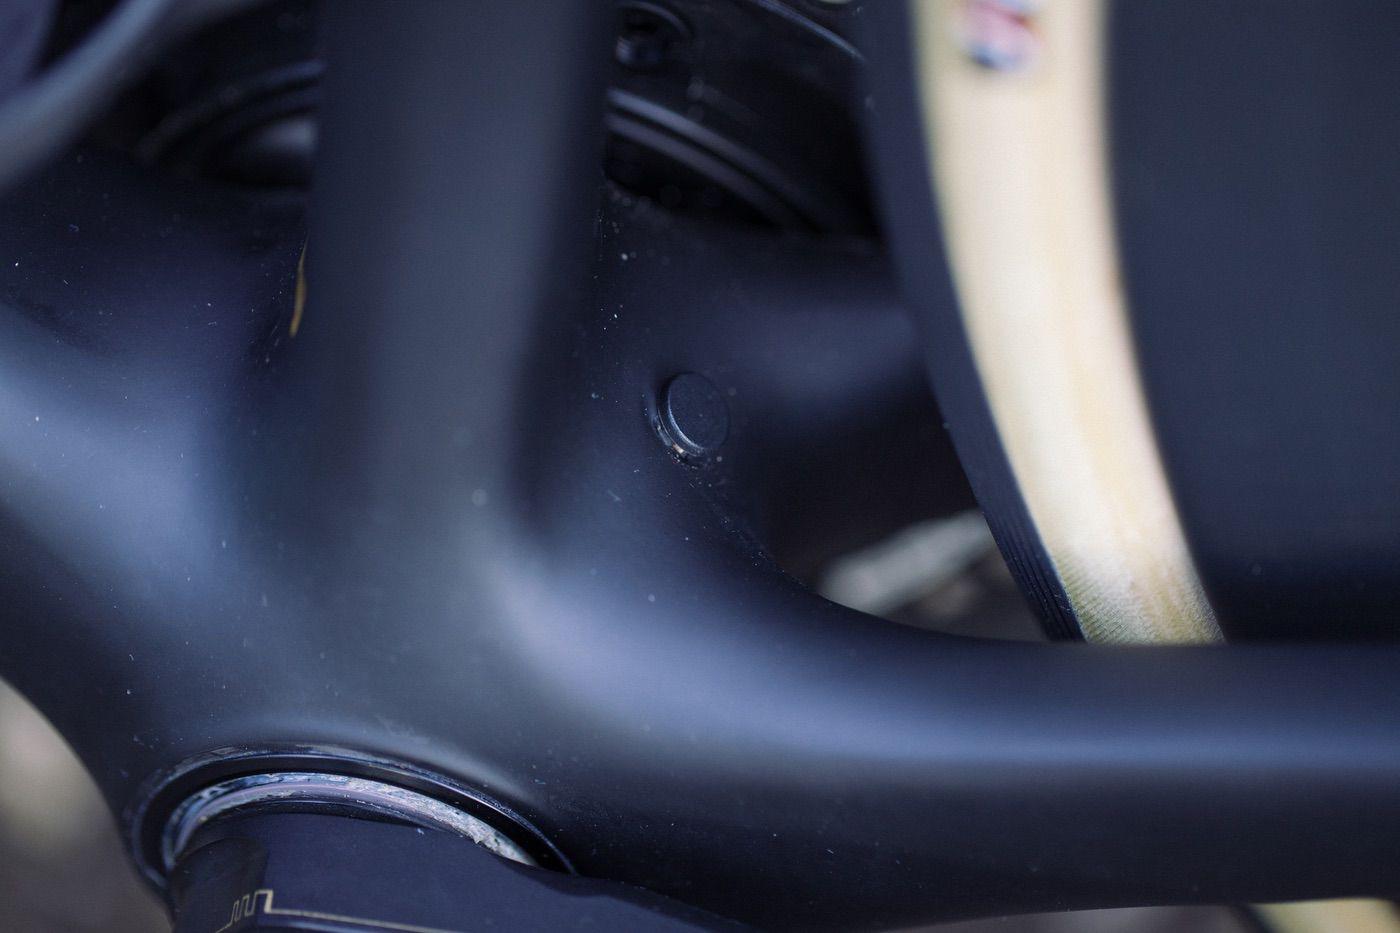 Pedalier de la Cannondale SuperSix Evo 2020